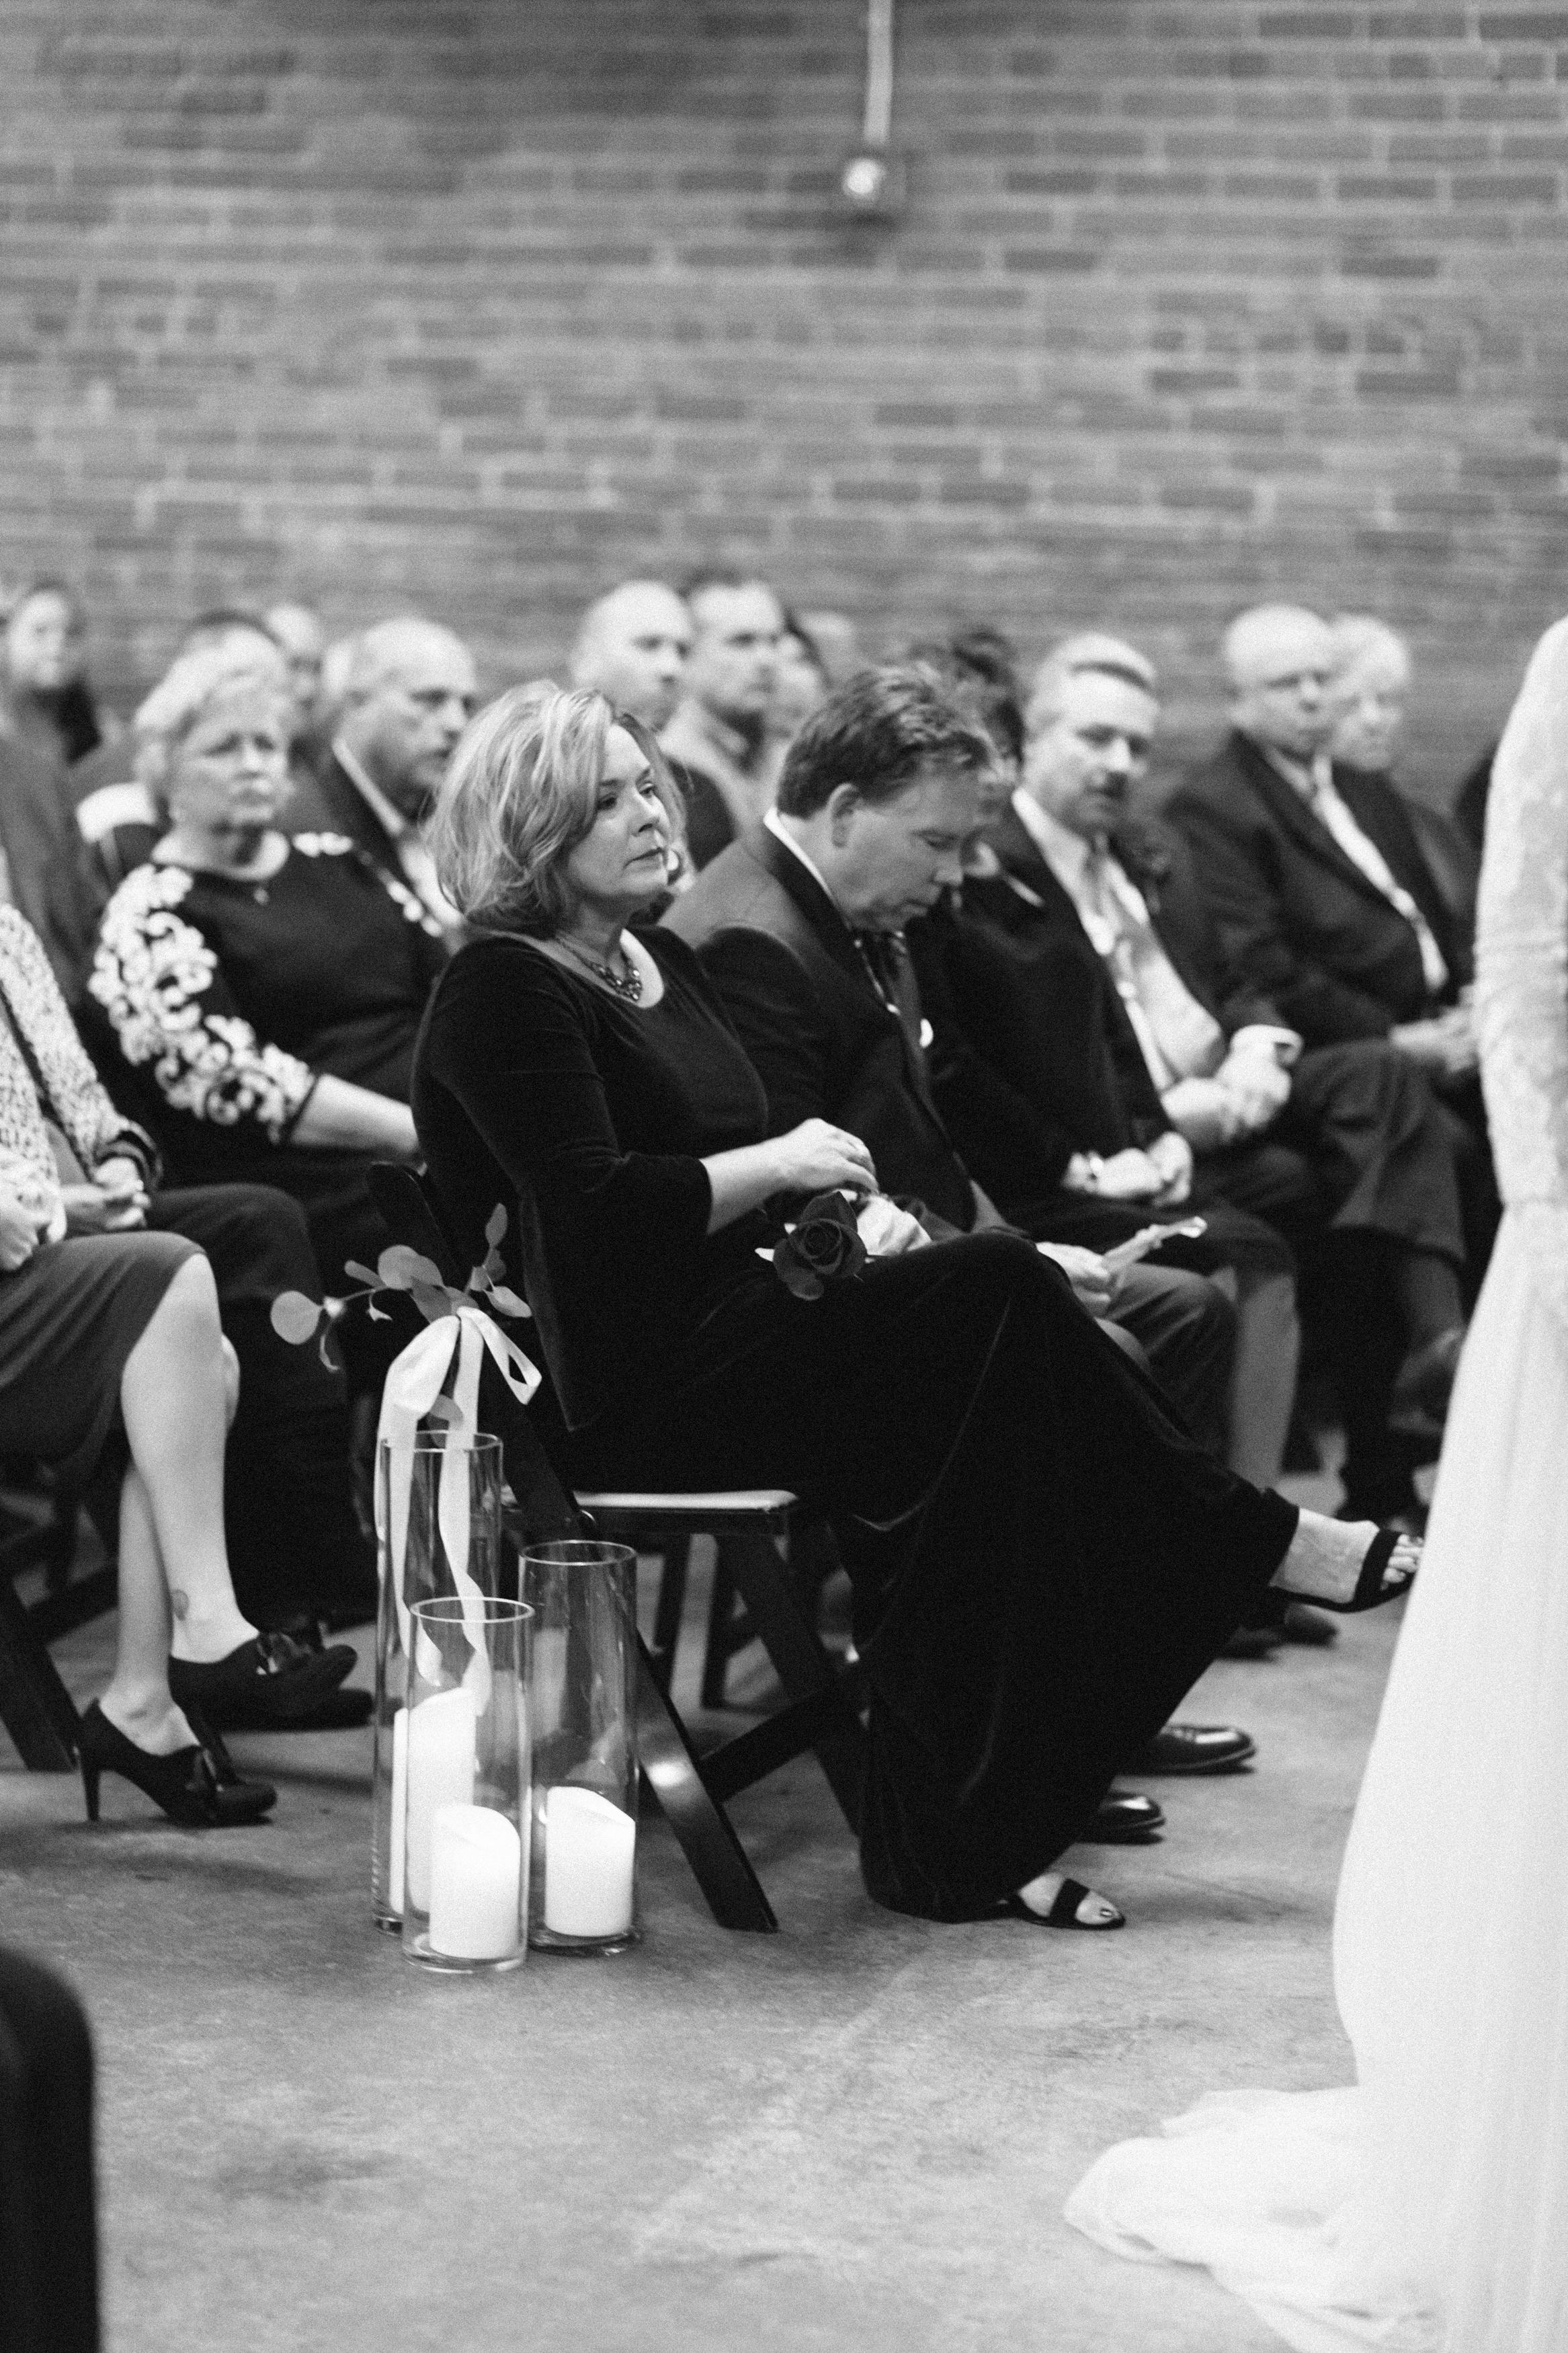 Lauren_Jeremy_Standard_Wedding_Knoxville_Abigail_Malone_Photography_FIlm-471.jpg